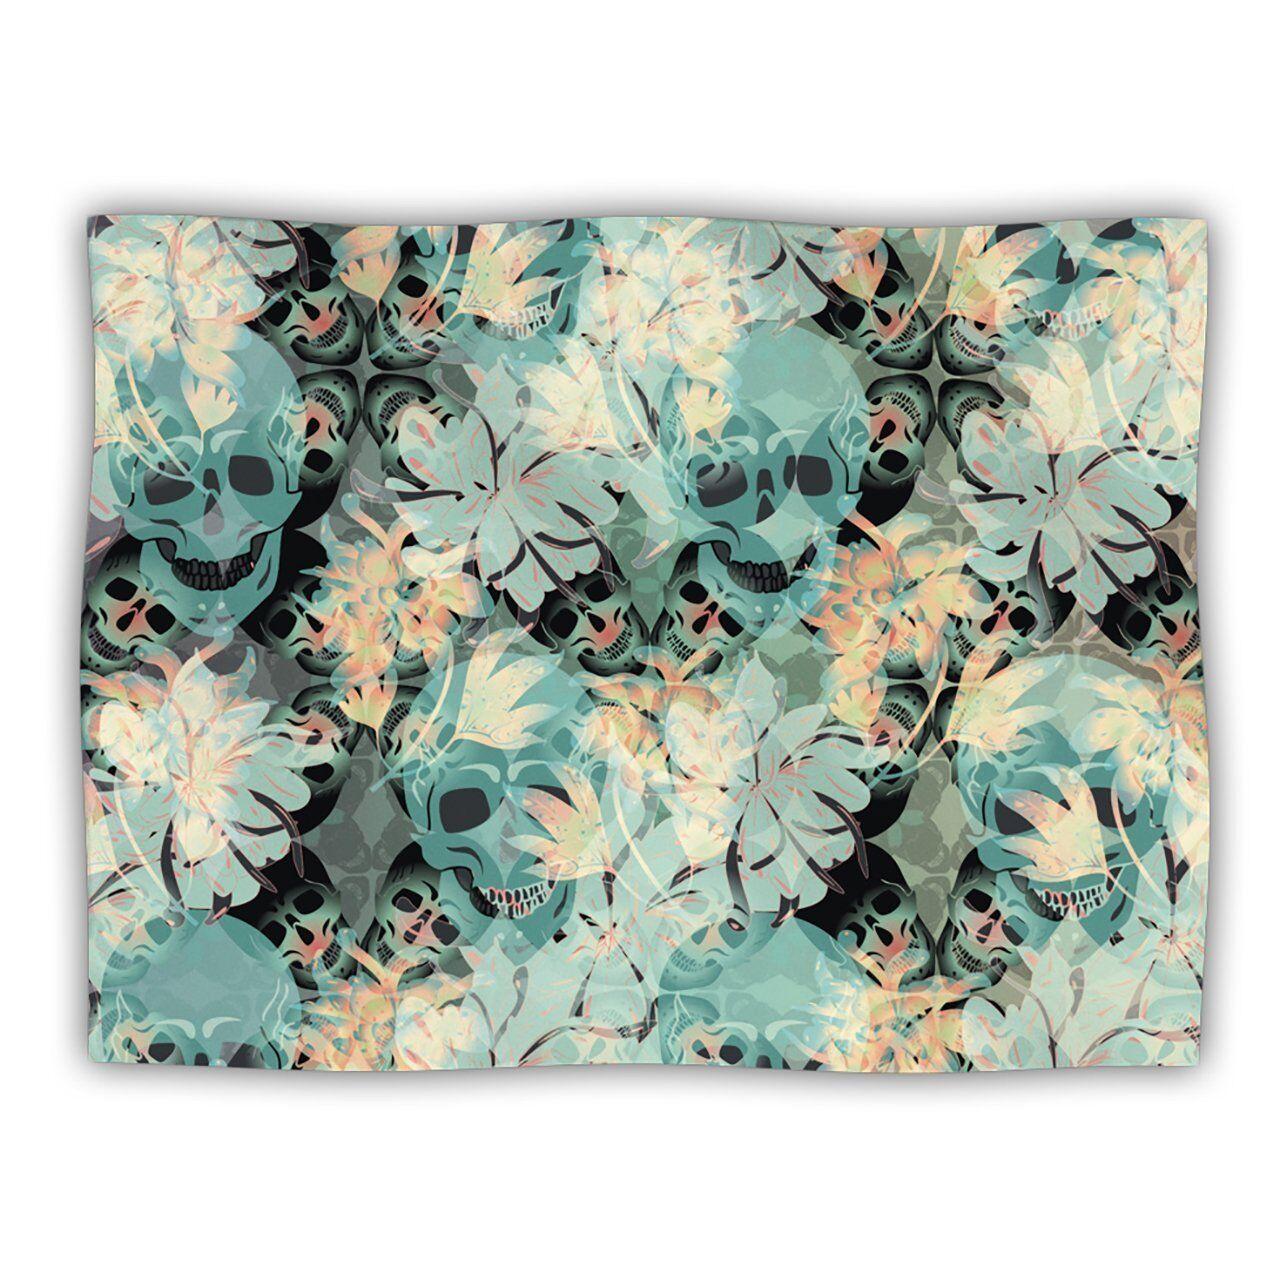 Kess InHouse Akwaflorell  Dead's Head Party  Dog Blanket, 60 by 50-Inch